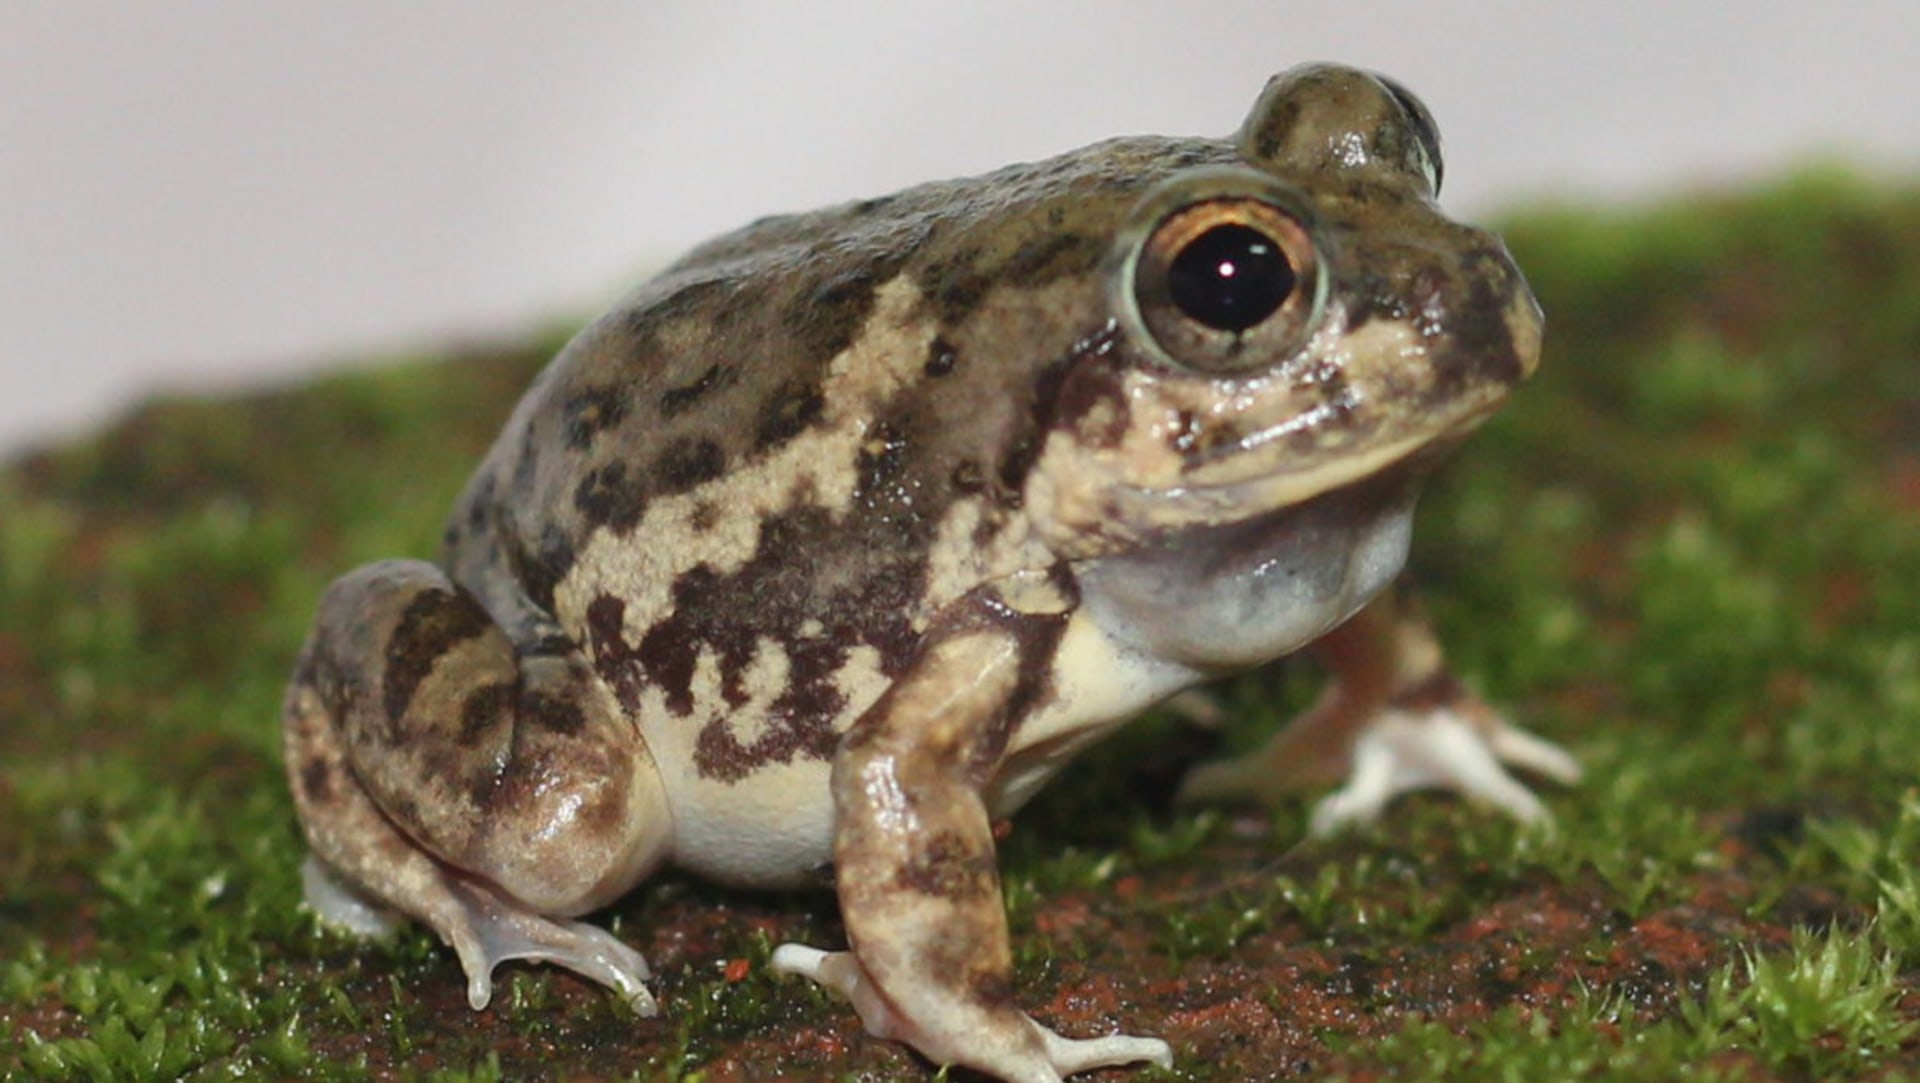 Magadha Burrowing Frog: Resident of Farms